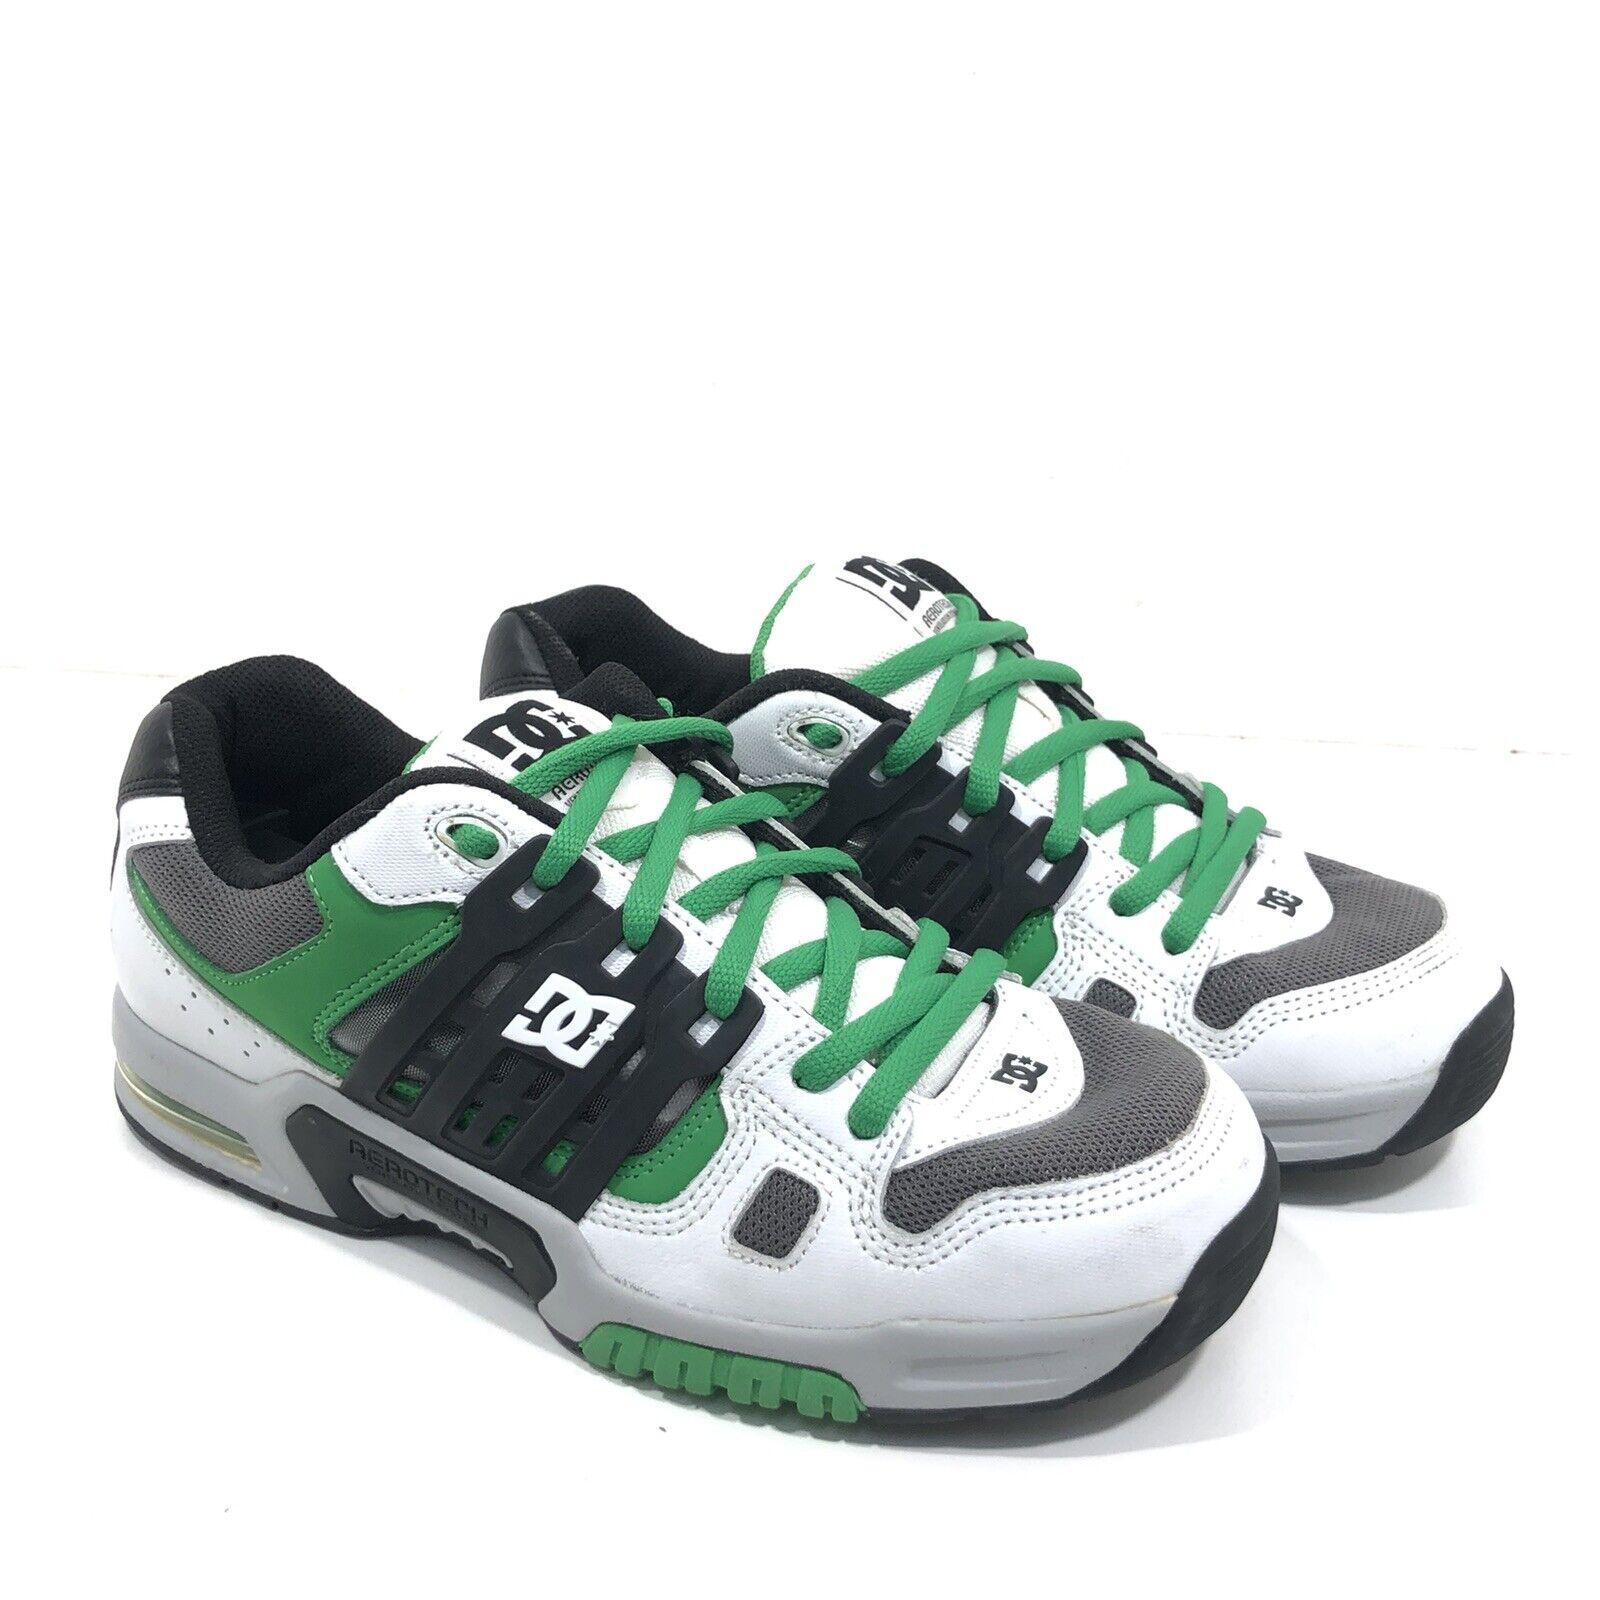 DC Skateboard Shoes AEROTECH 2 Mens